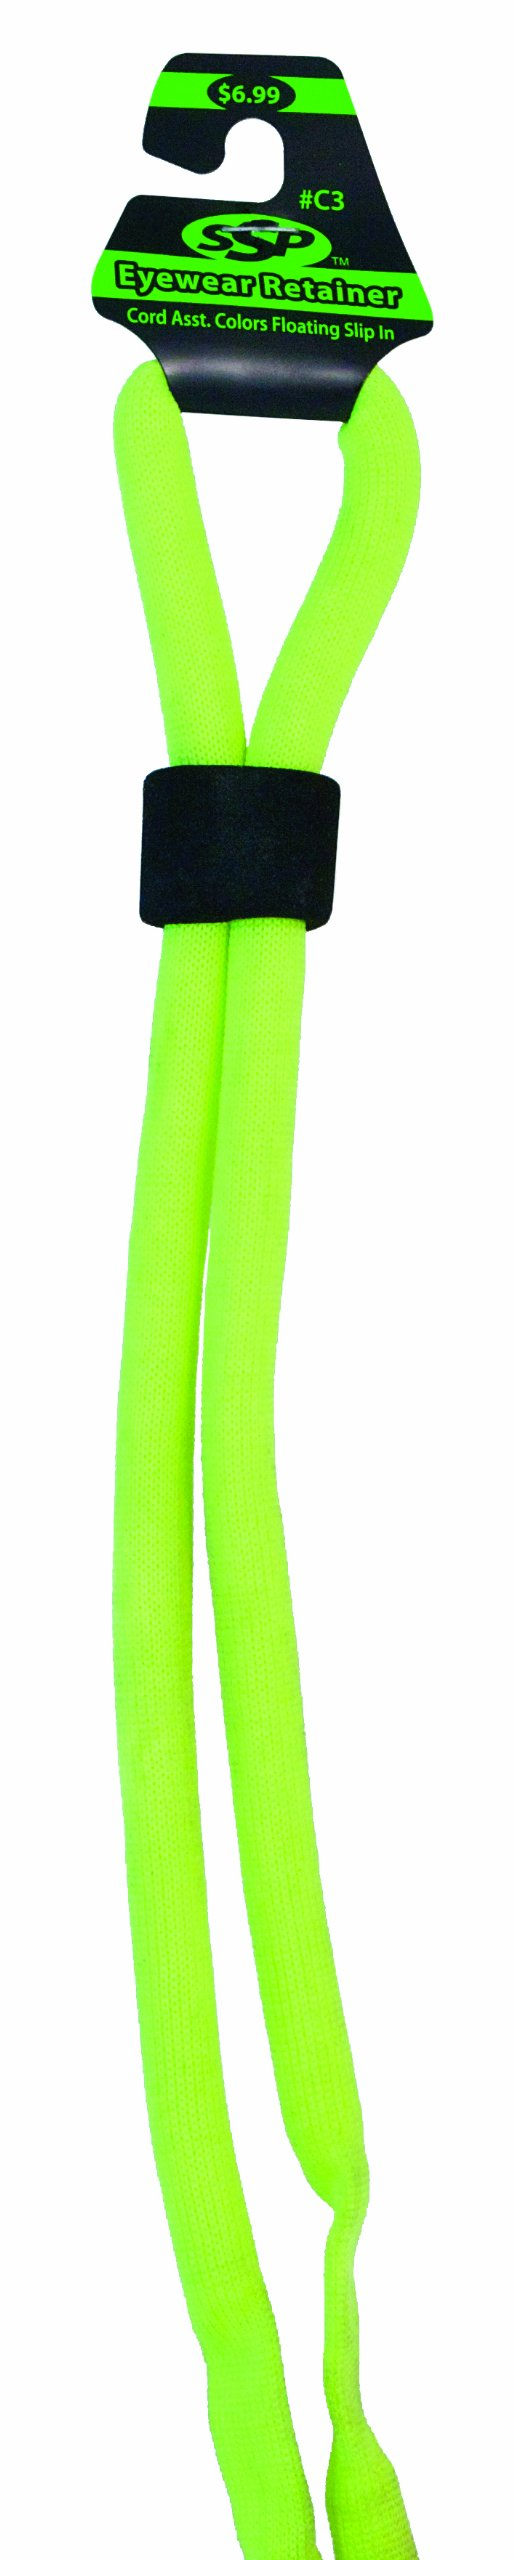 SSP Eyewear Floating Eyewear Retainer Cord, Yellow, CORD3 YLW